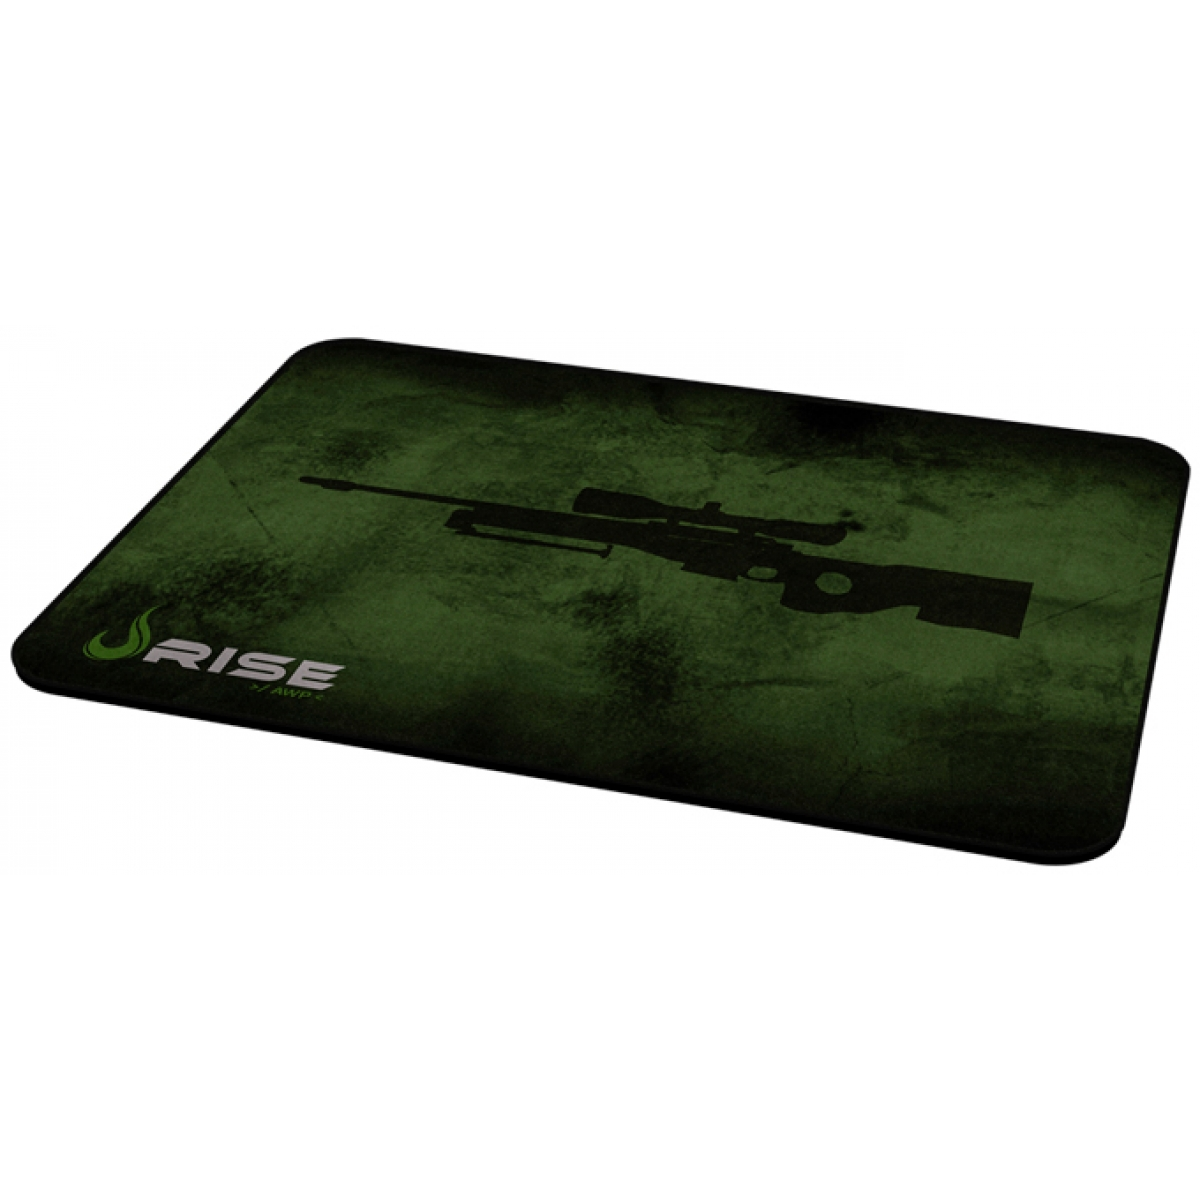 Mouse Pad Gamer Rise Mode Sniper RG-MP-04-SNP Médio Borda Costurada